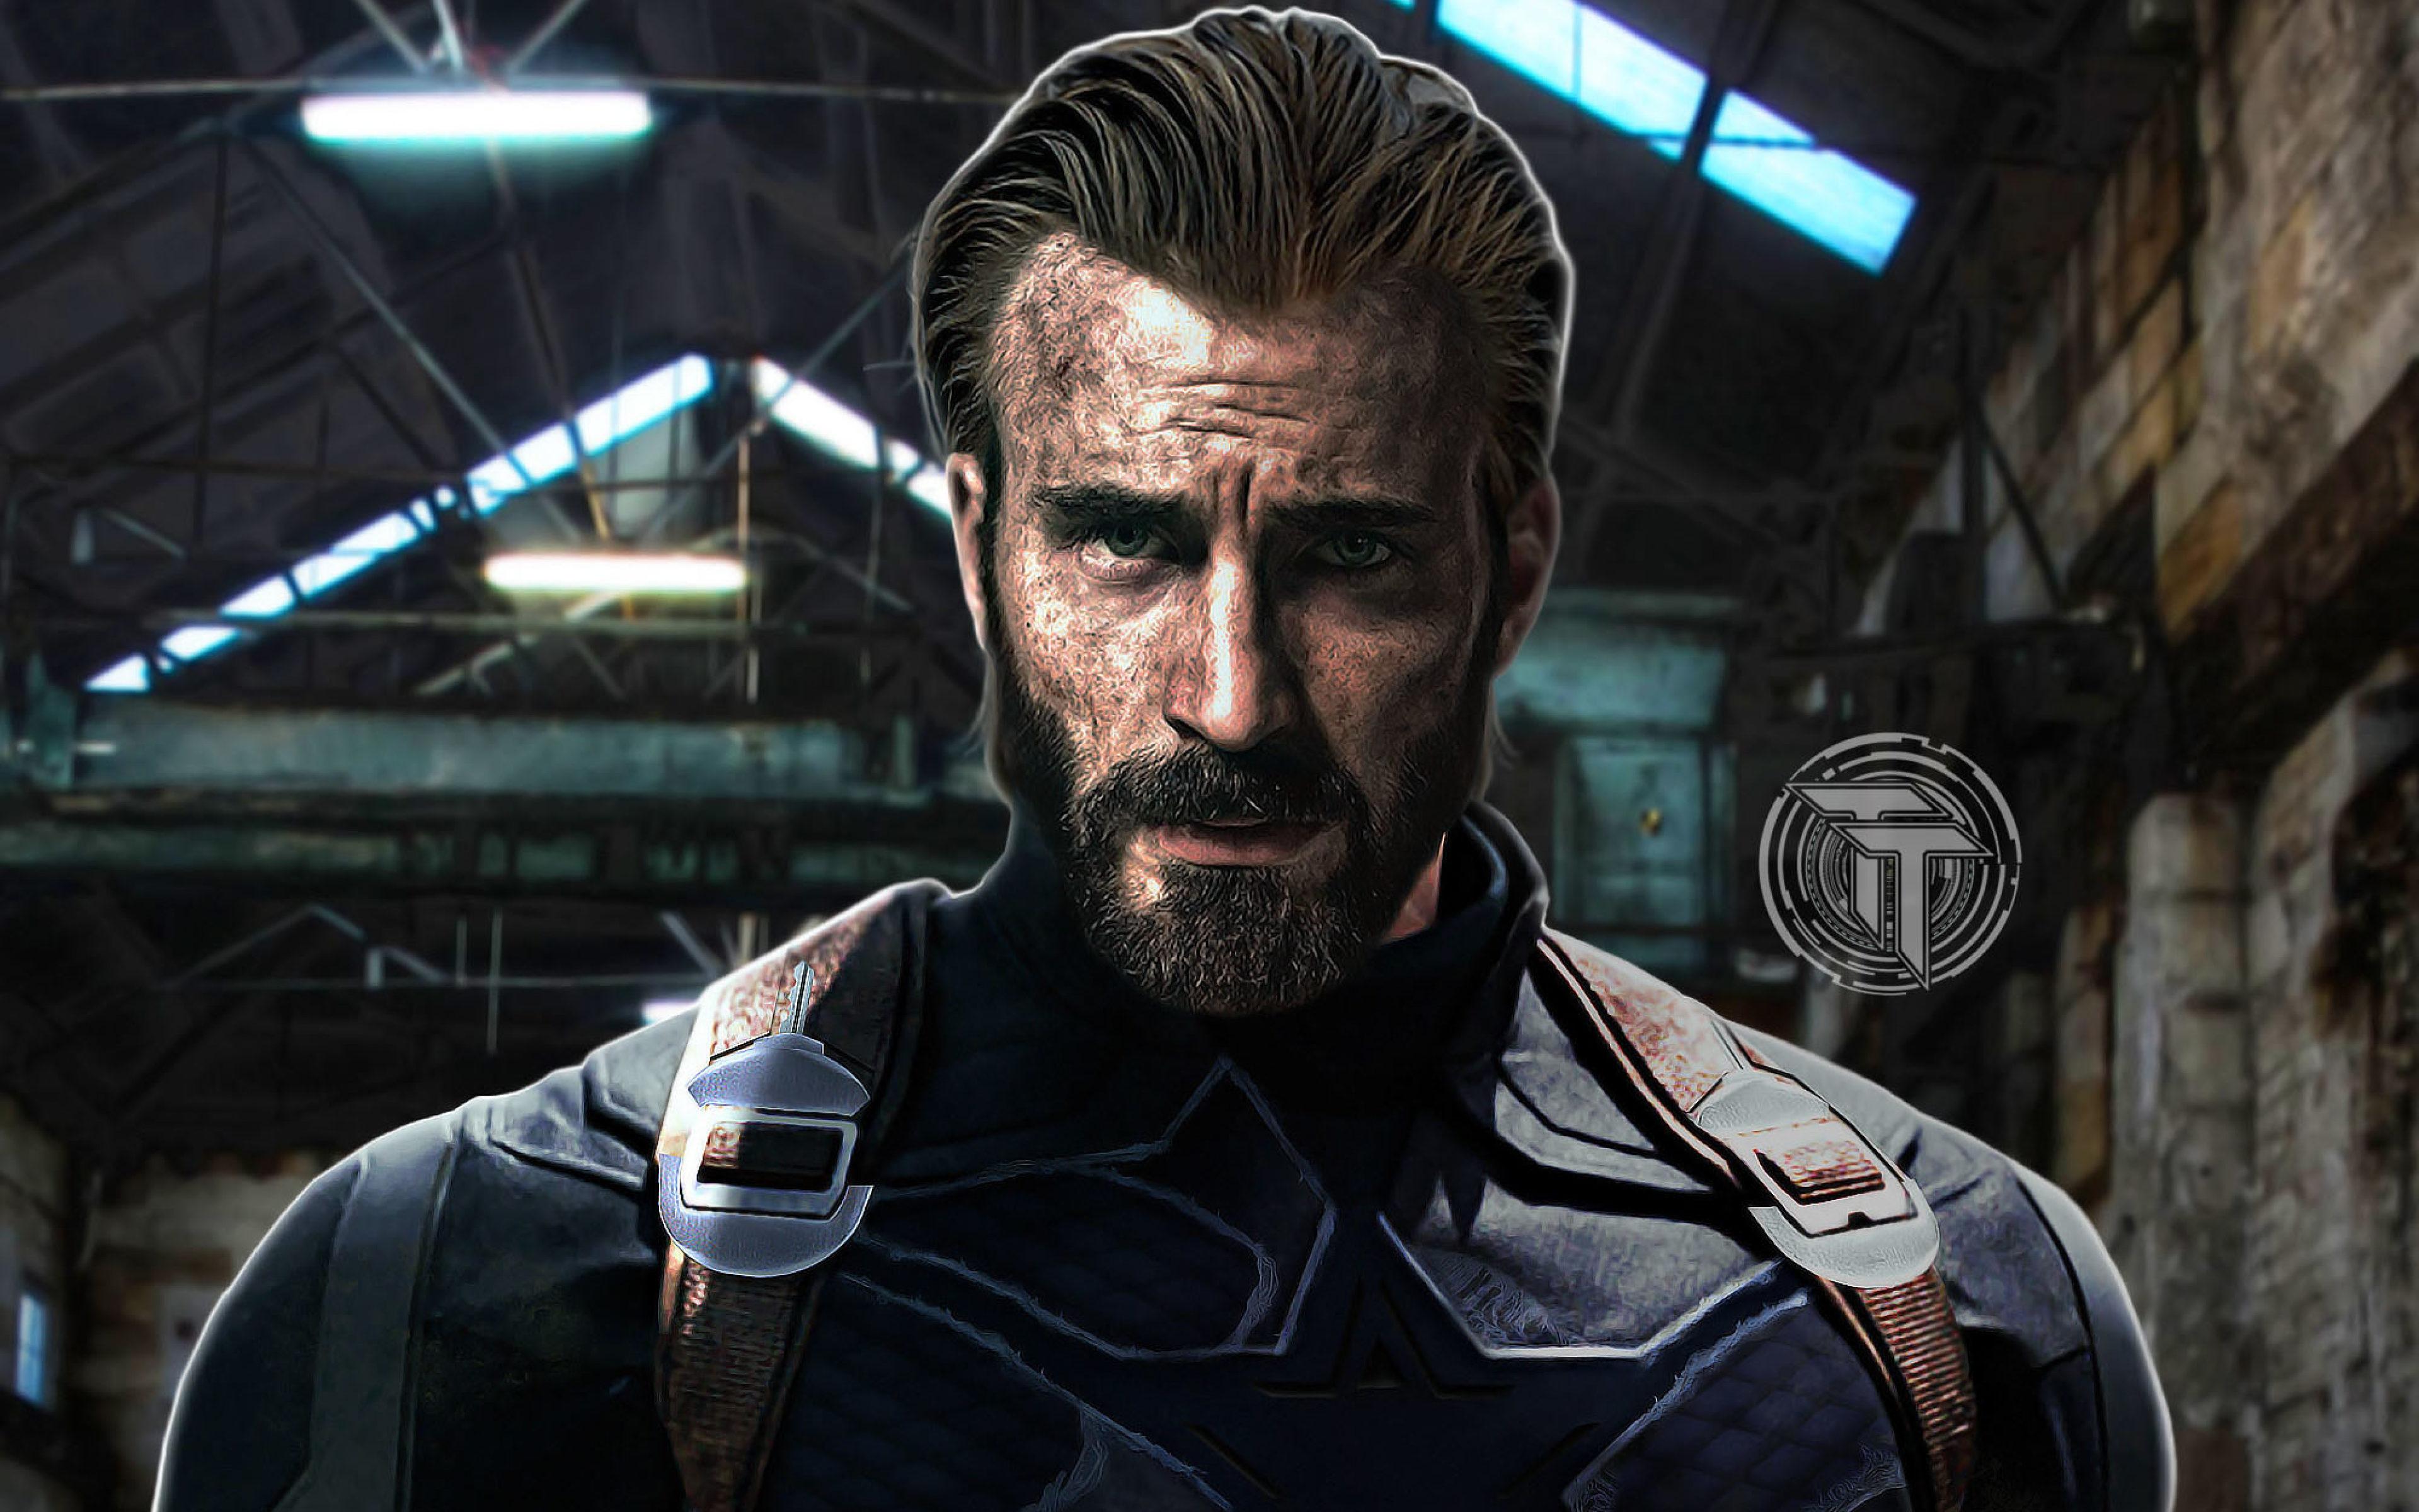 3840x2400 Captain America Beard Look In Infinity War 4K 3840x2400 3839x2400